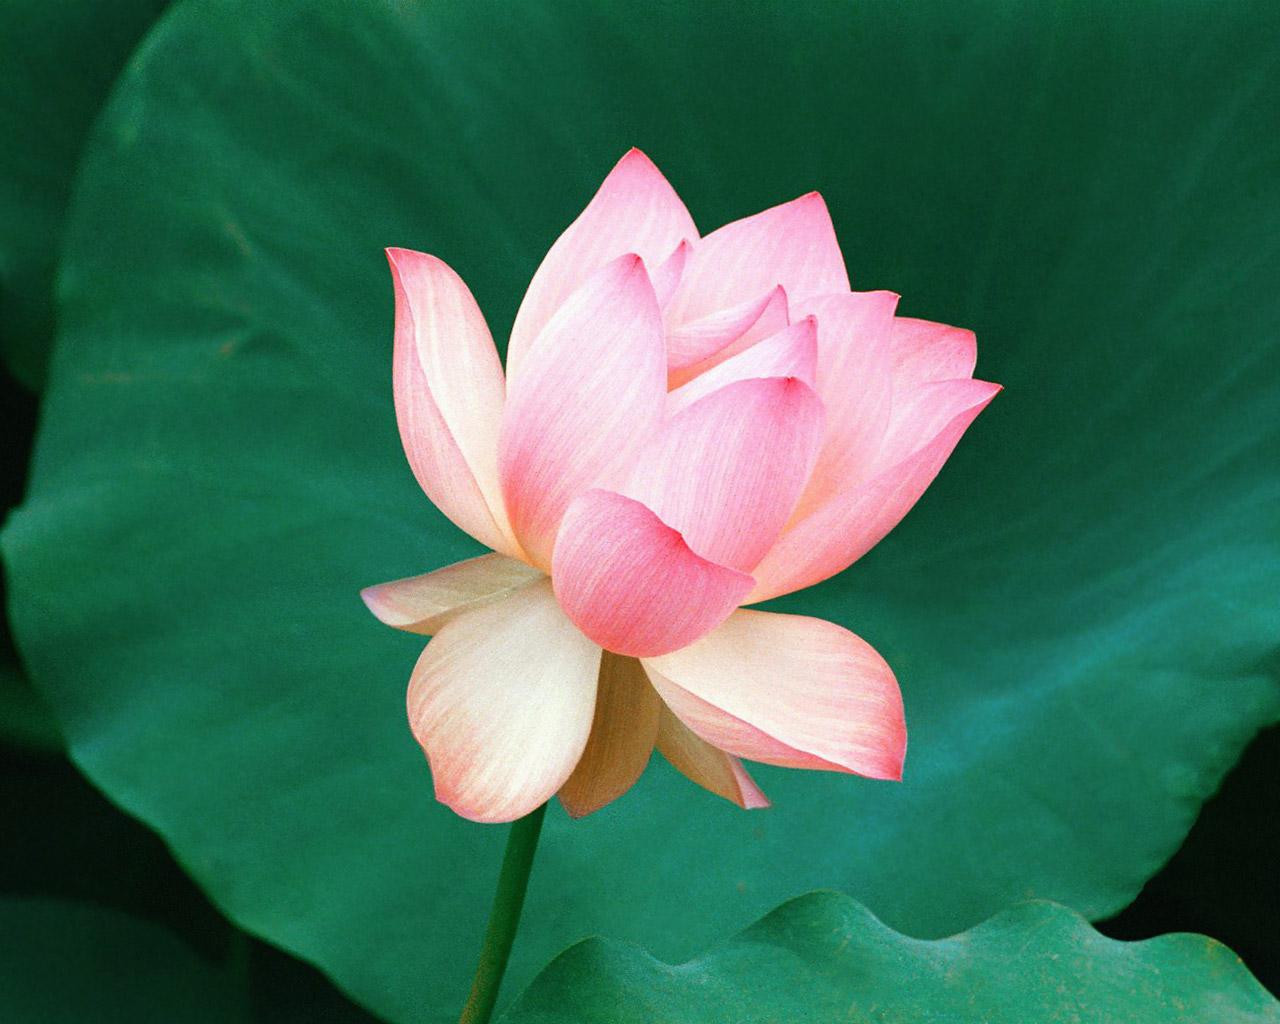 Hwfd National Indian Lotus Flower Desktop Background 1280 X 1024